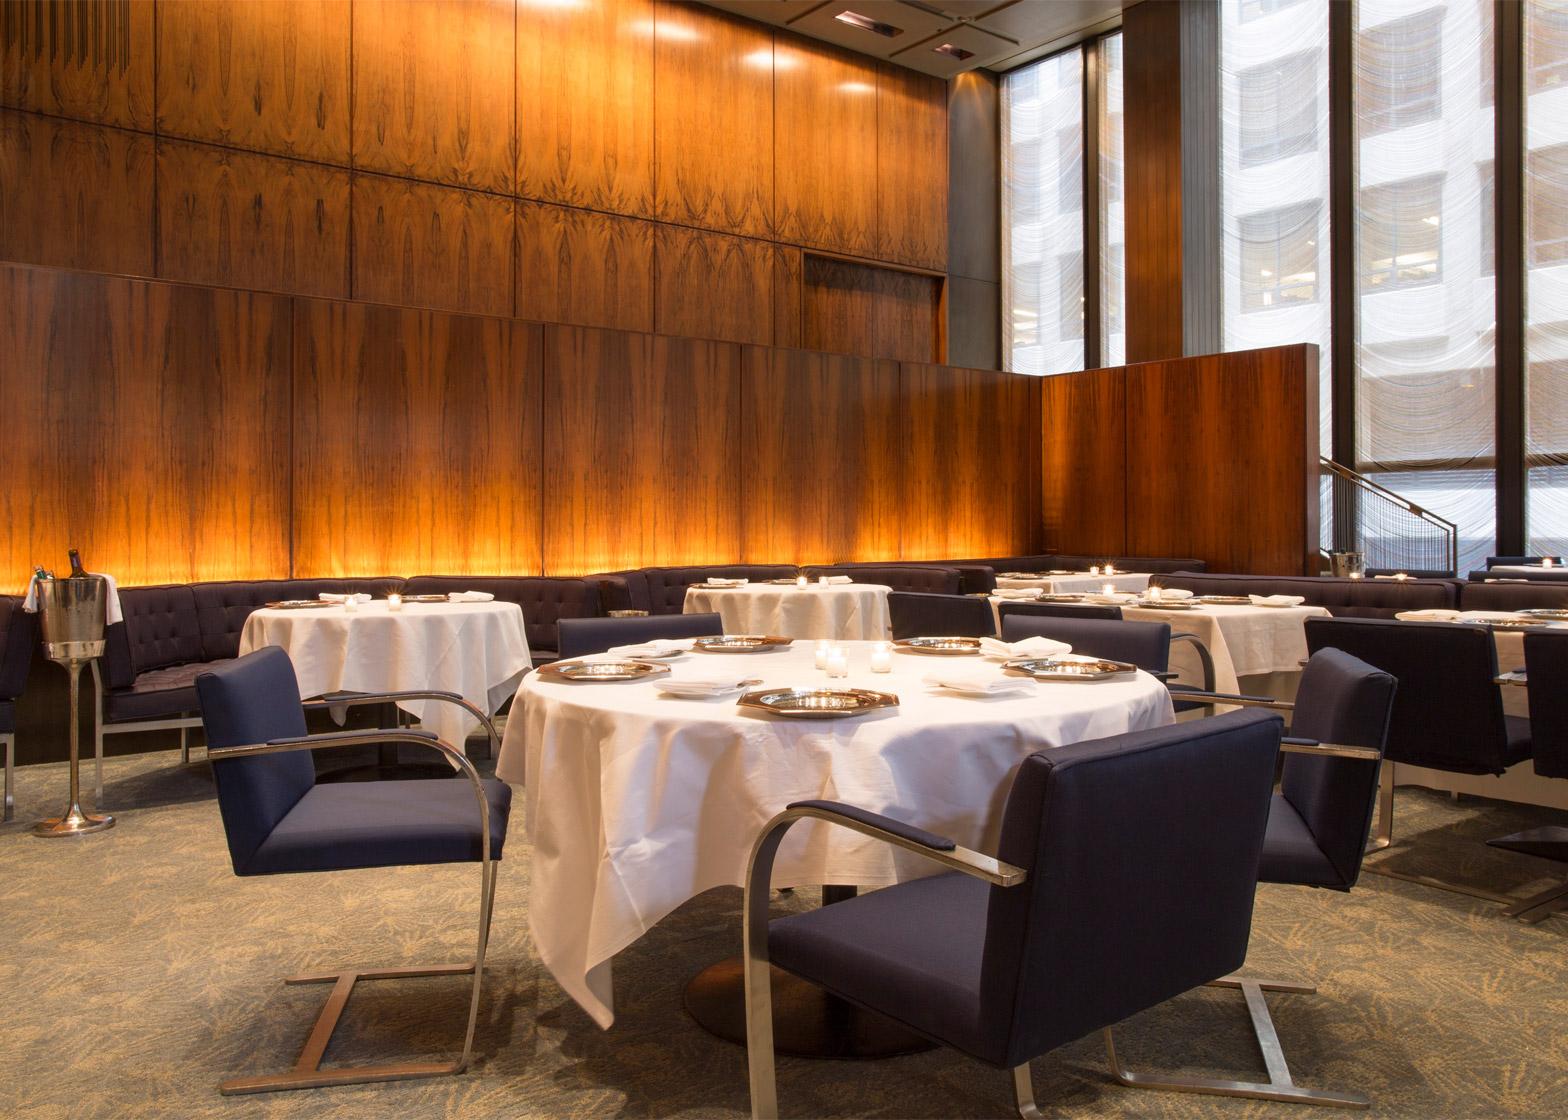 four-seasons-restaurant-interior-seagram-building-philip-johnson-mies-van-der-rohe-auction-new-york-city-usa-news_dezeen_1568_5